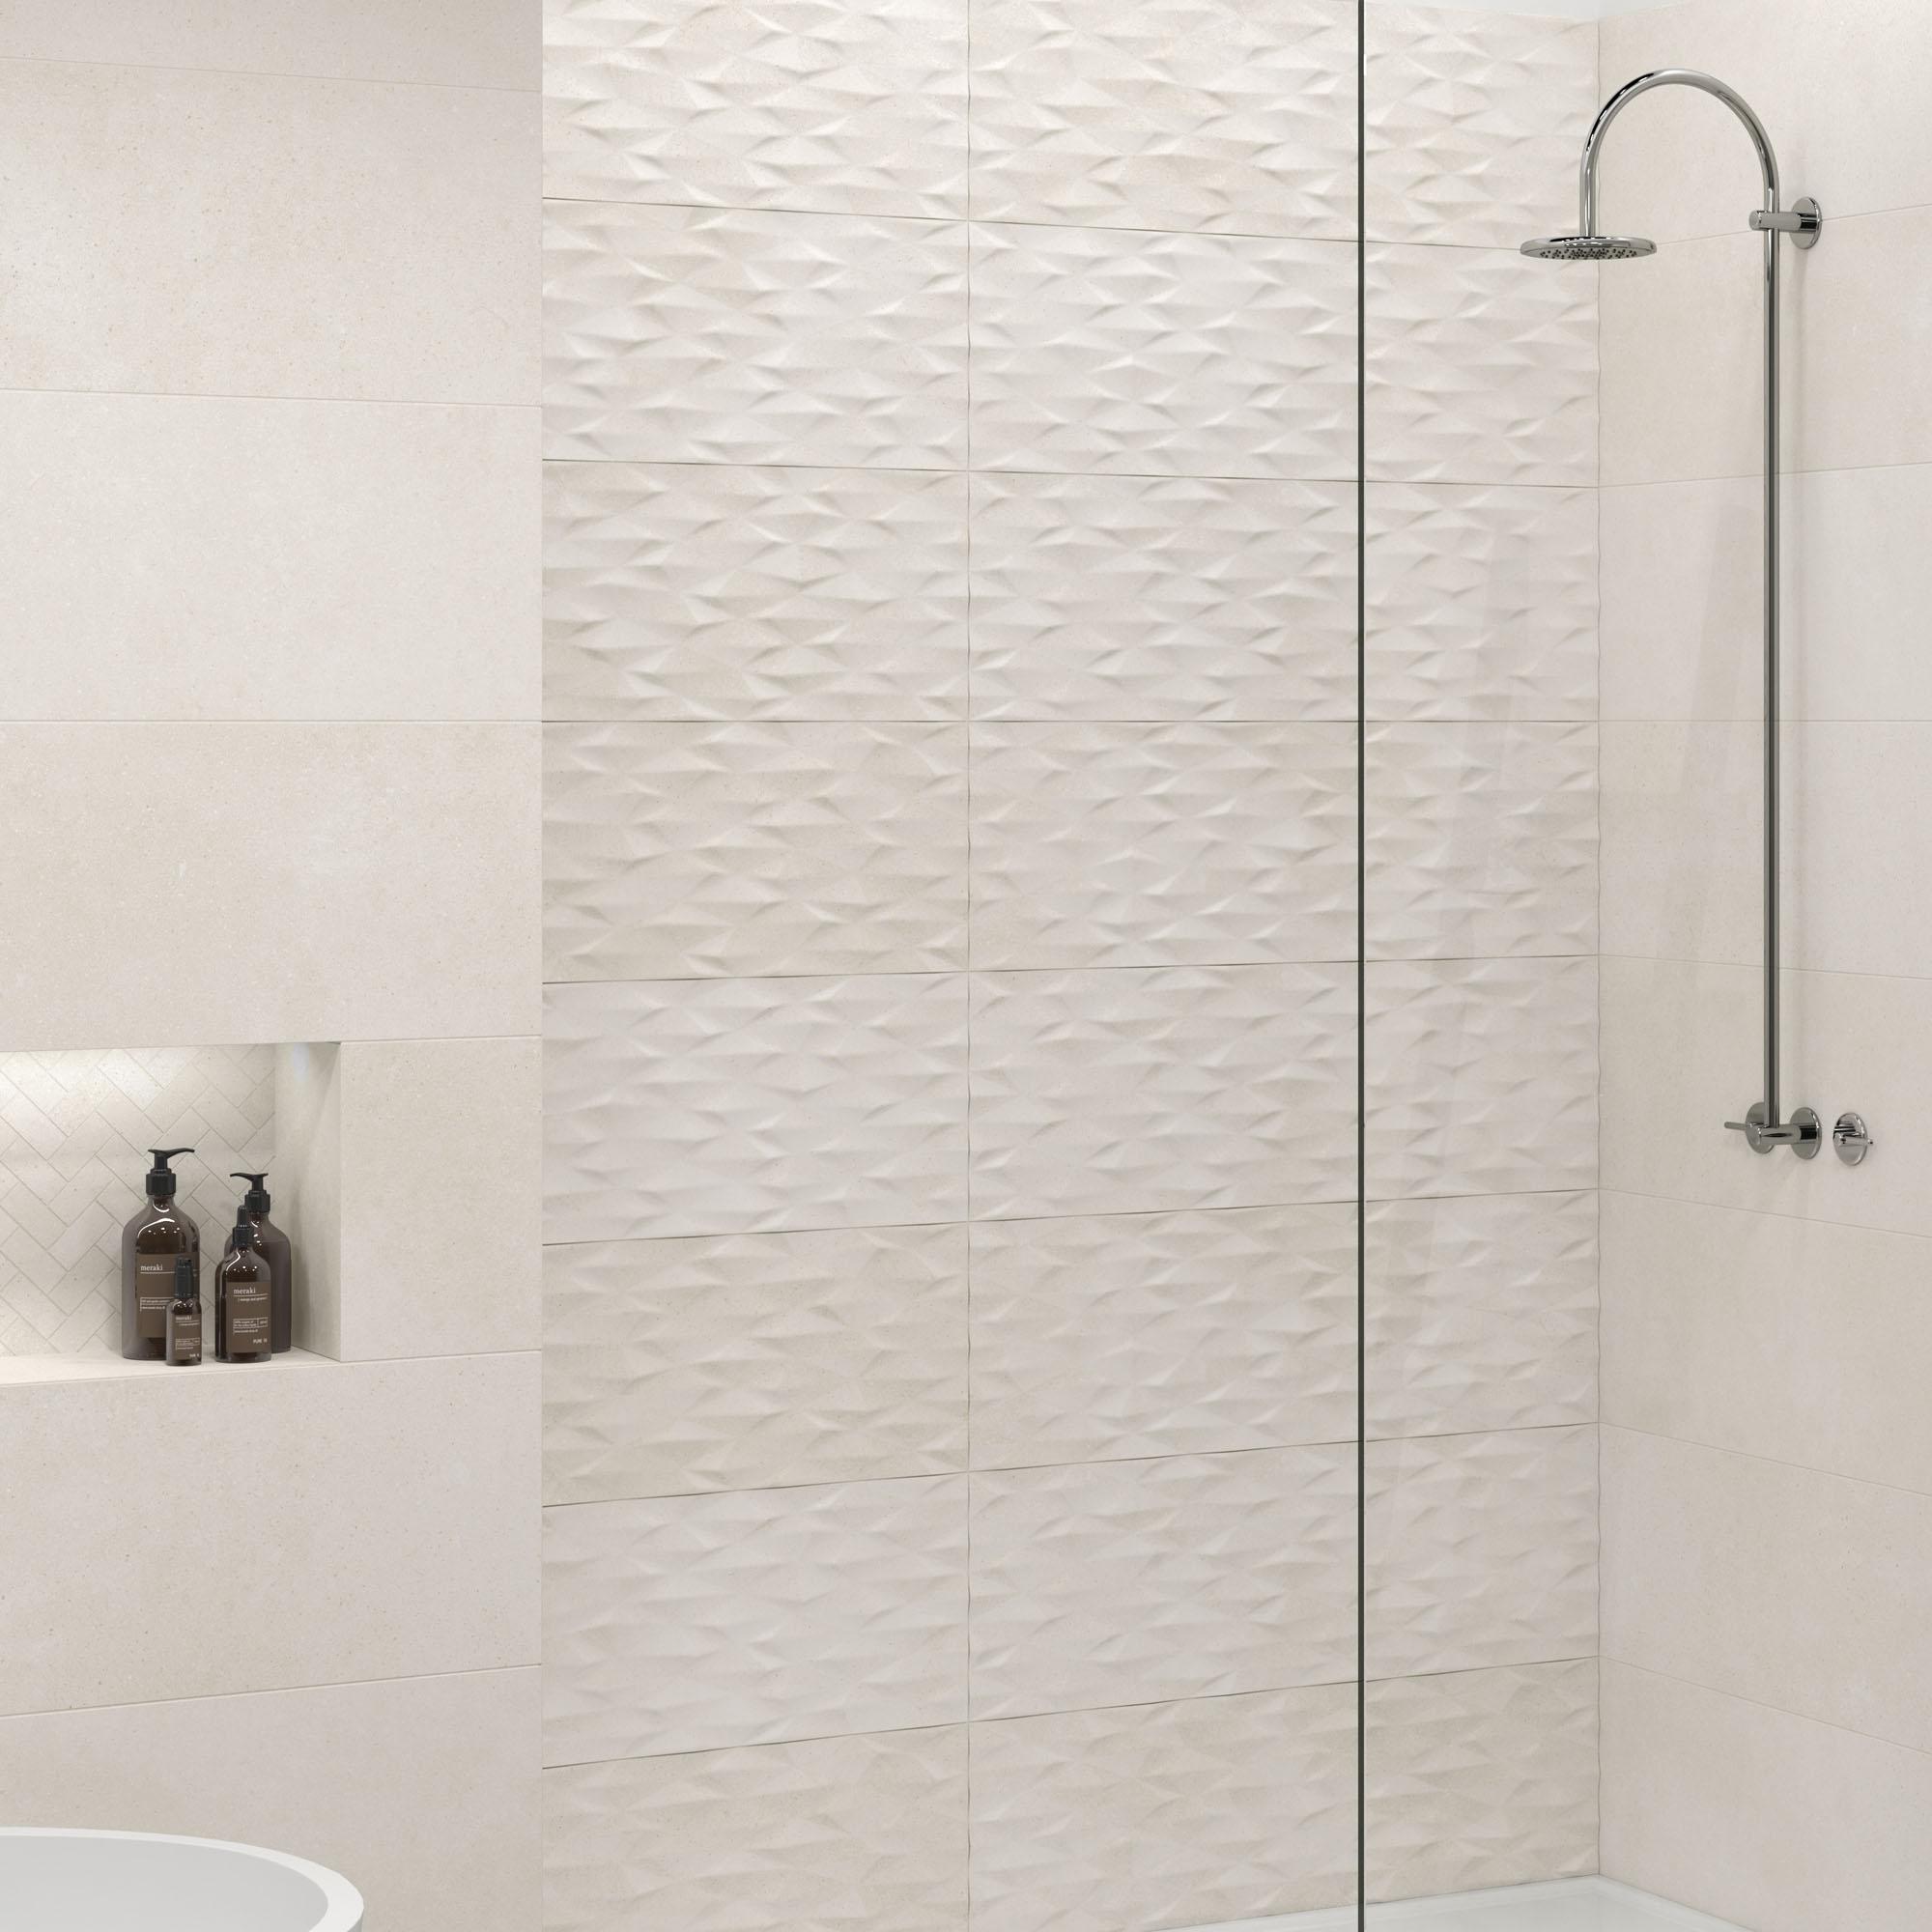 Serena-Beige-Noble-Raffia-WC-detalhe